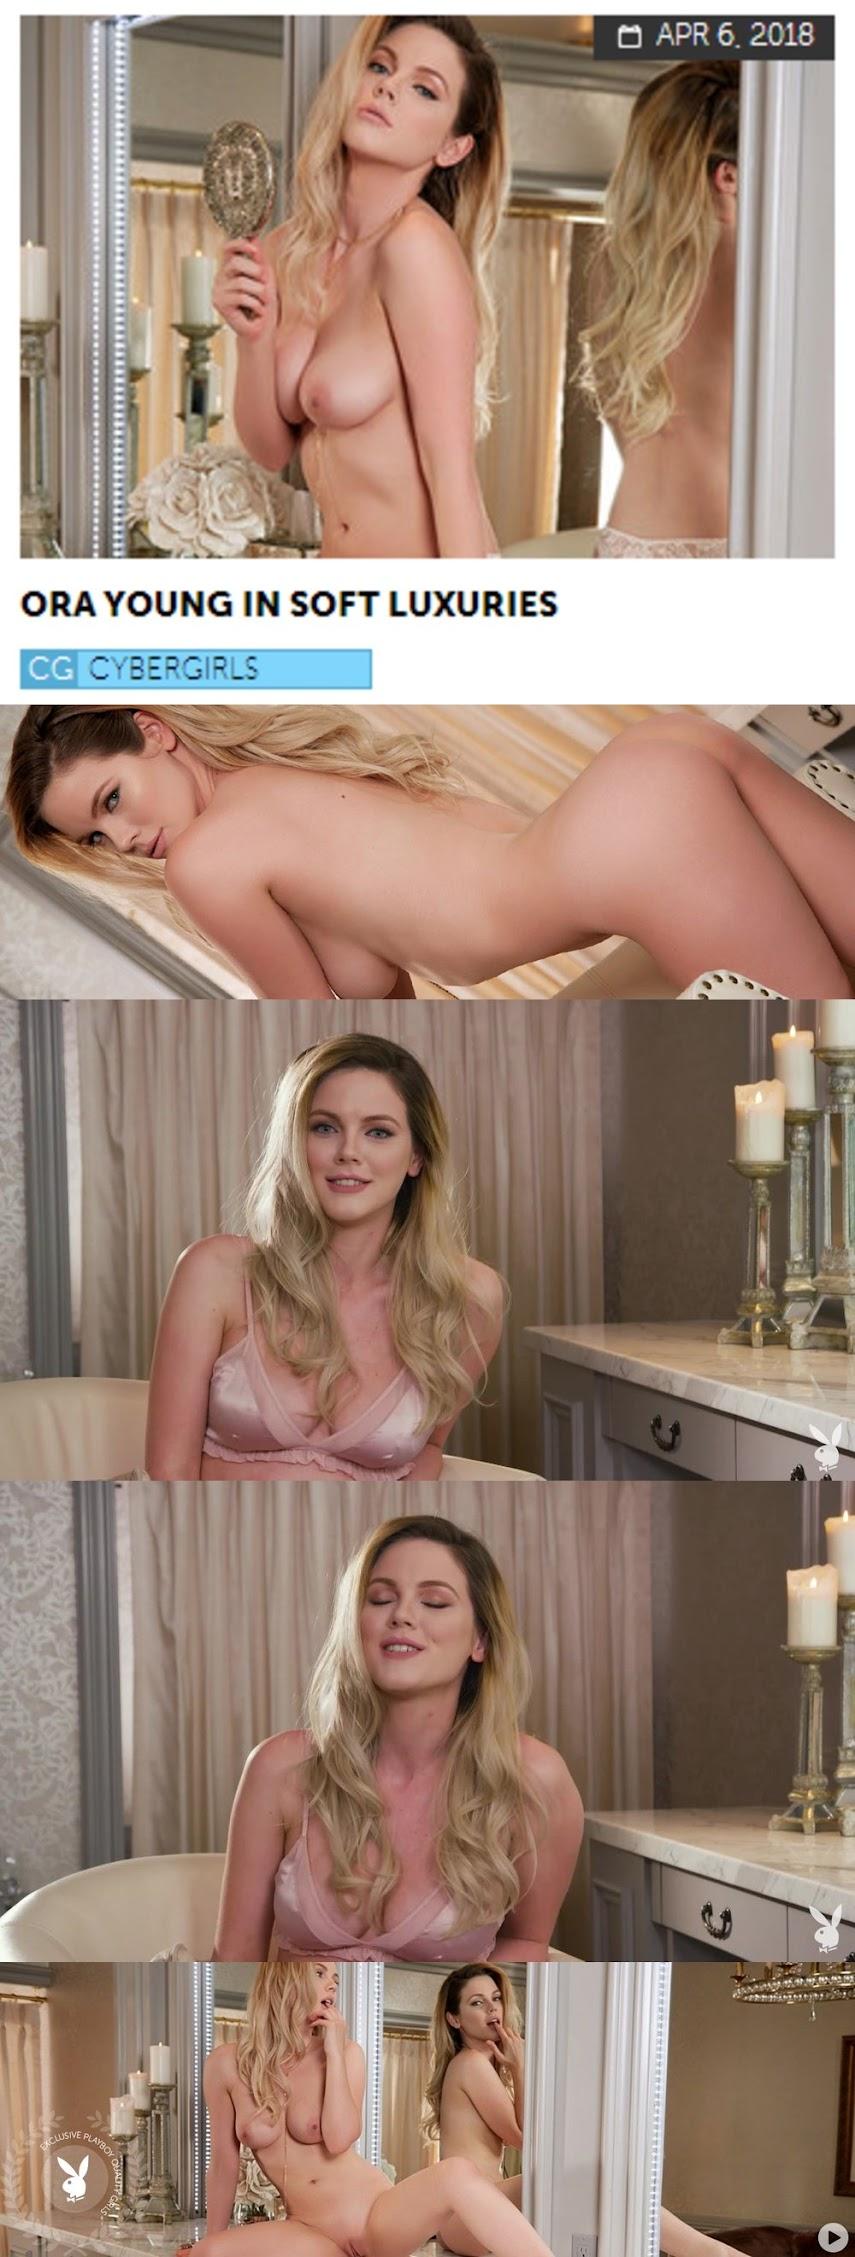 Playboy PlayboyPlus2018-04-06 Ora Young in Soft Luxuries - idols